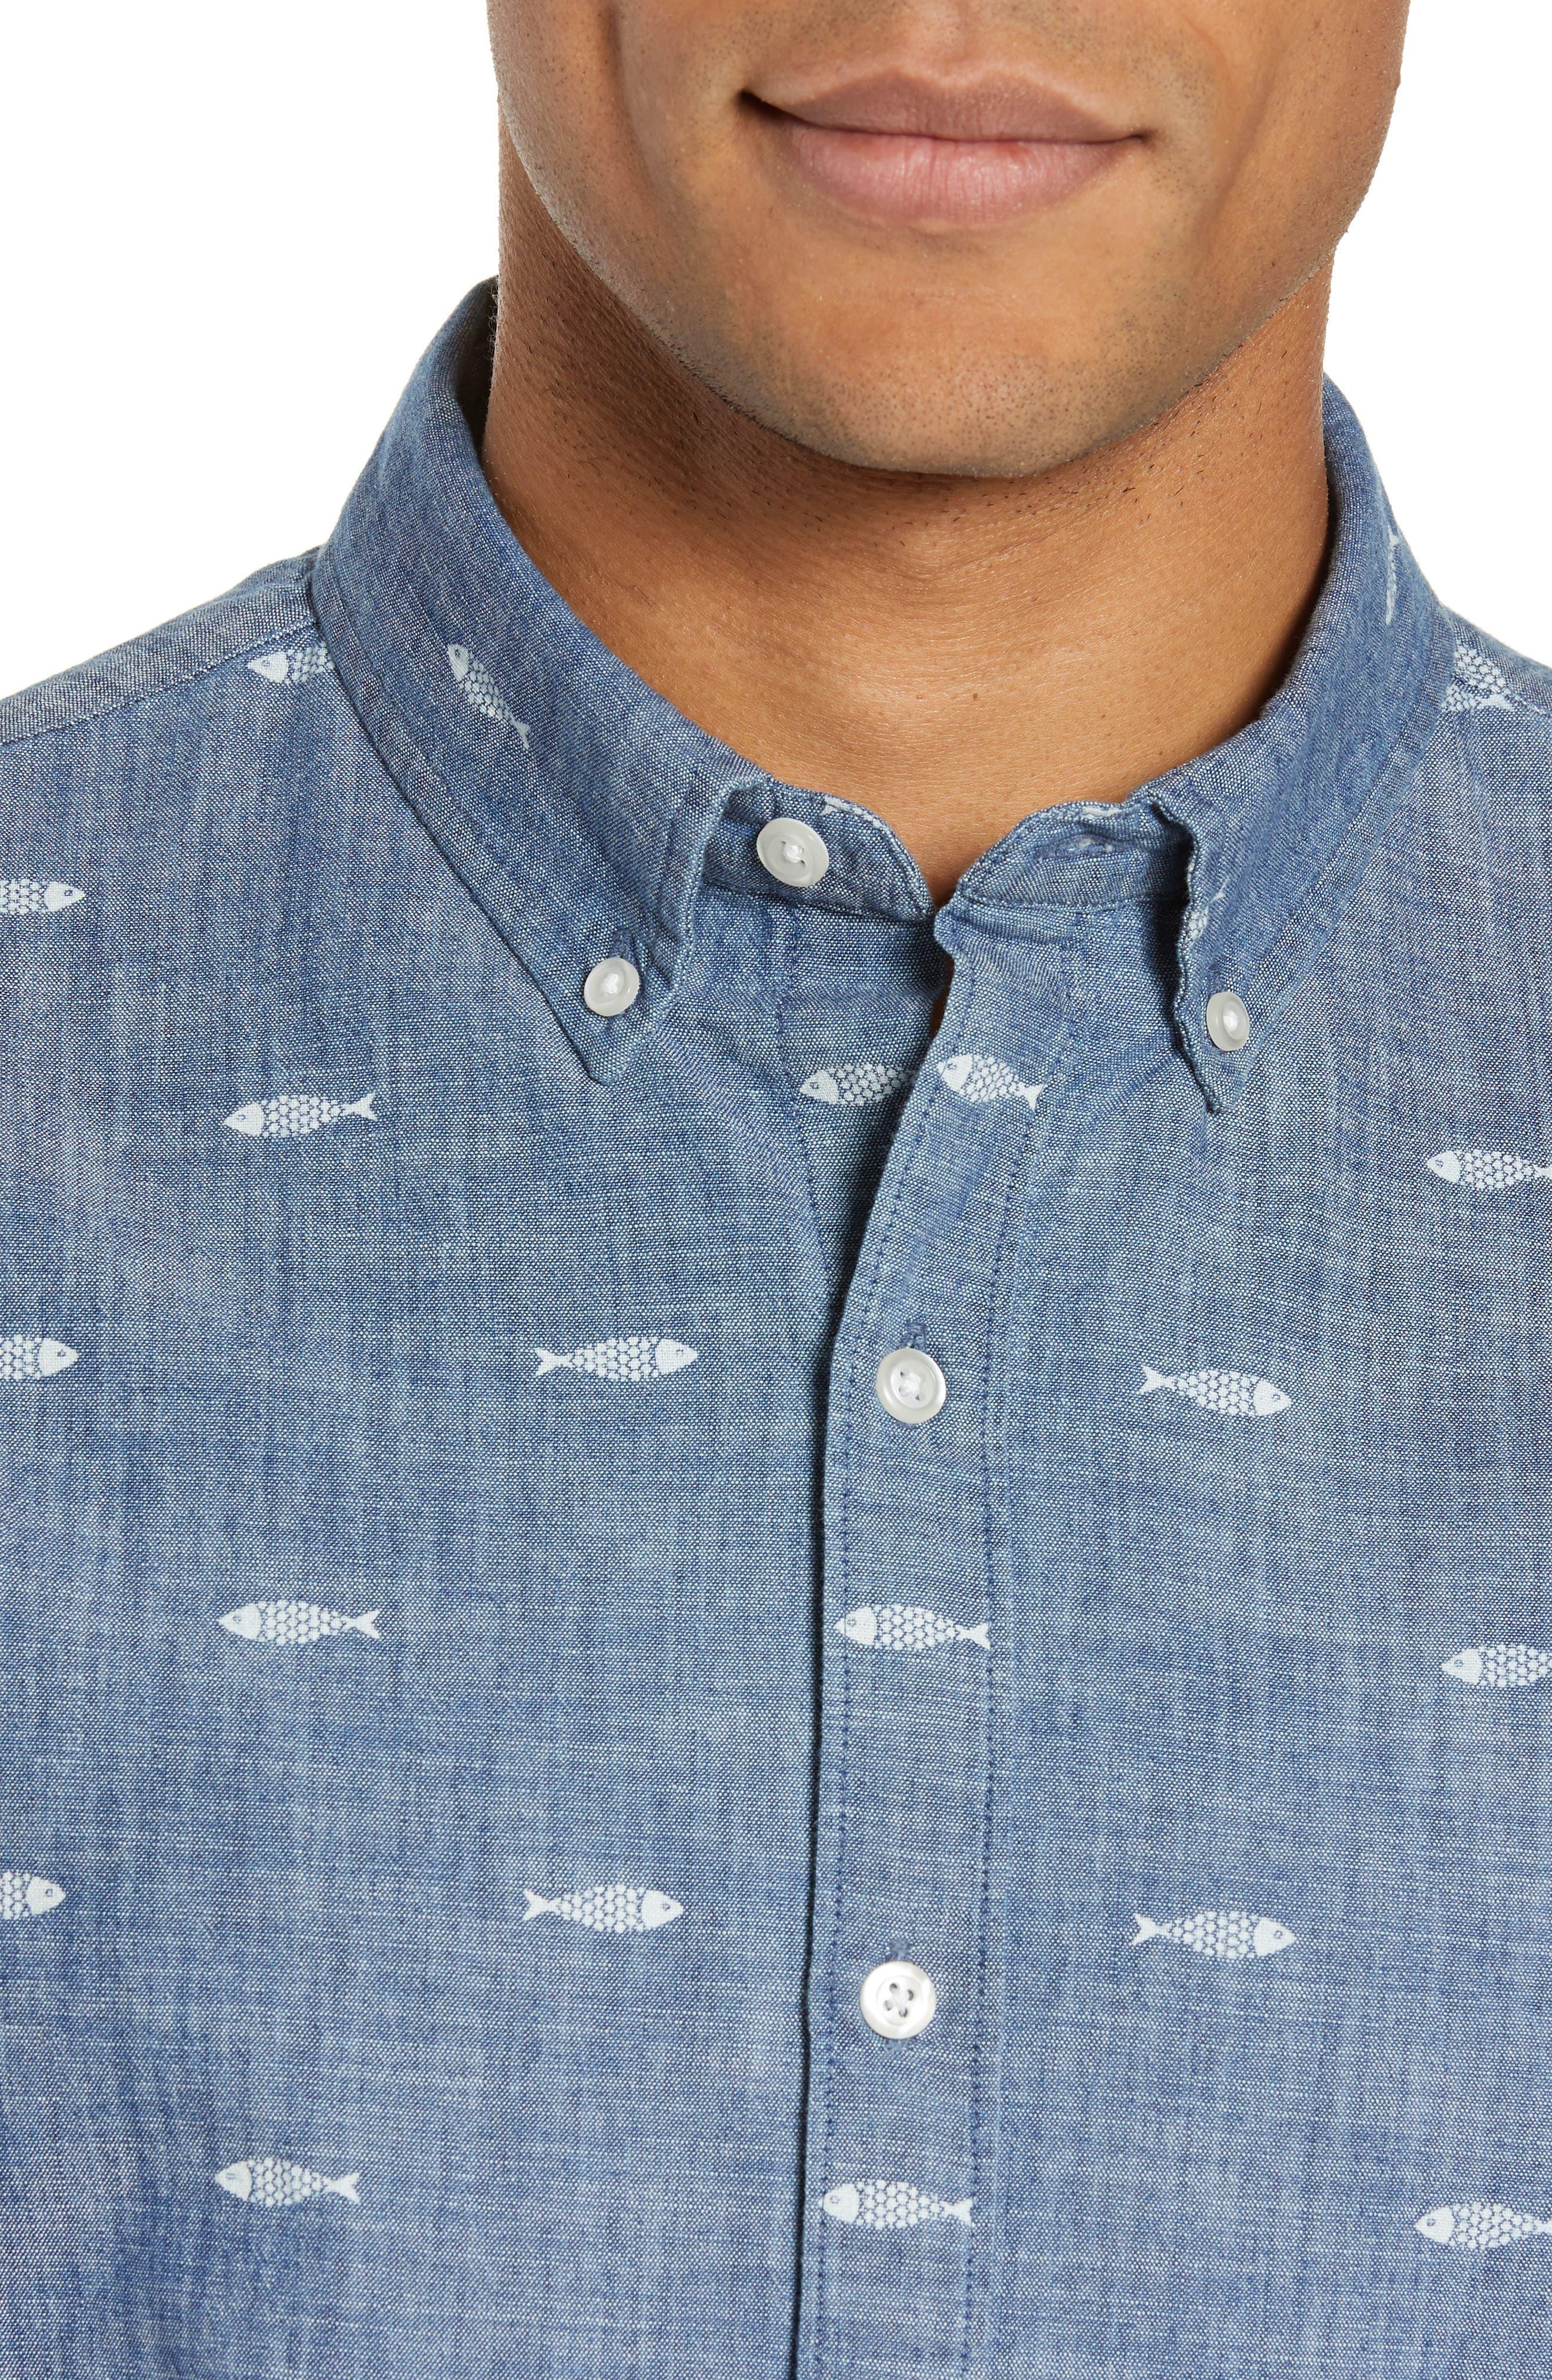 BONOBOS, Riviera Slim Fit Print Sport Shirt, Alternate thumbnail 2, color, CHAMBRAY SARDEEN SCATTER